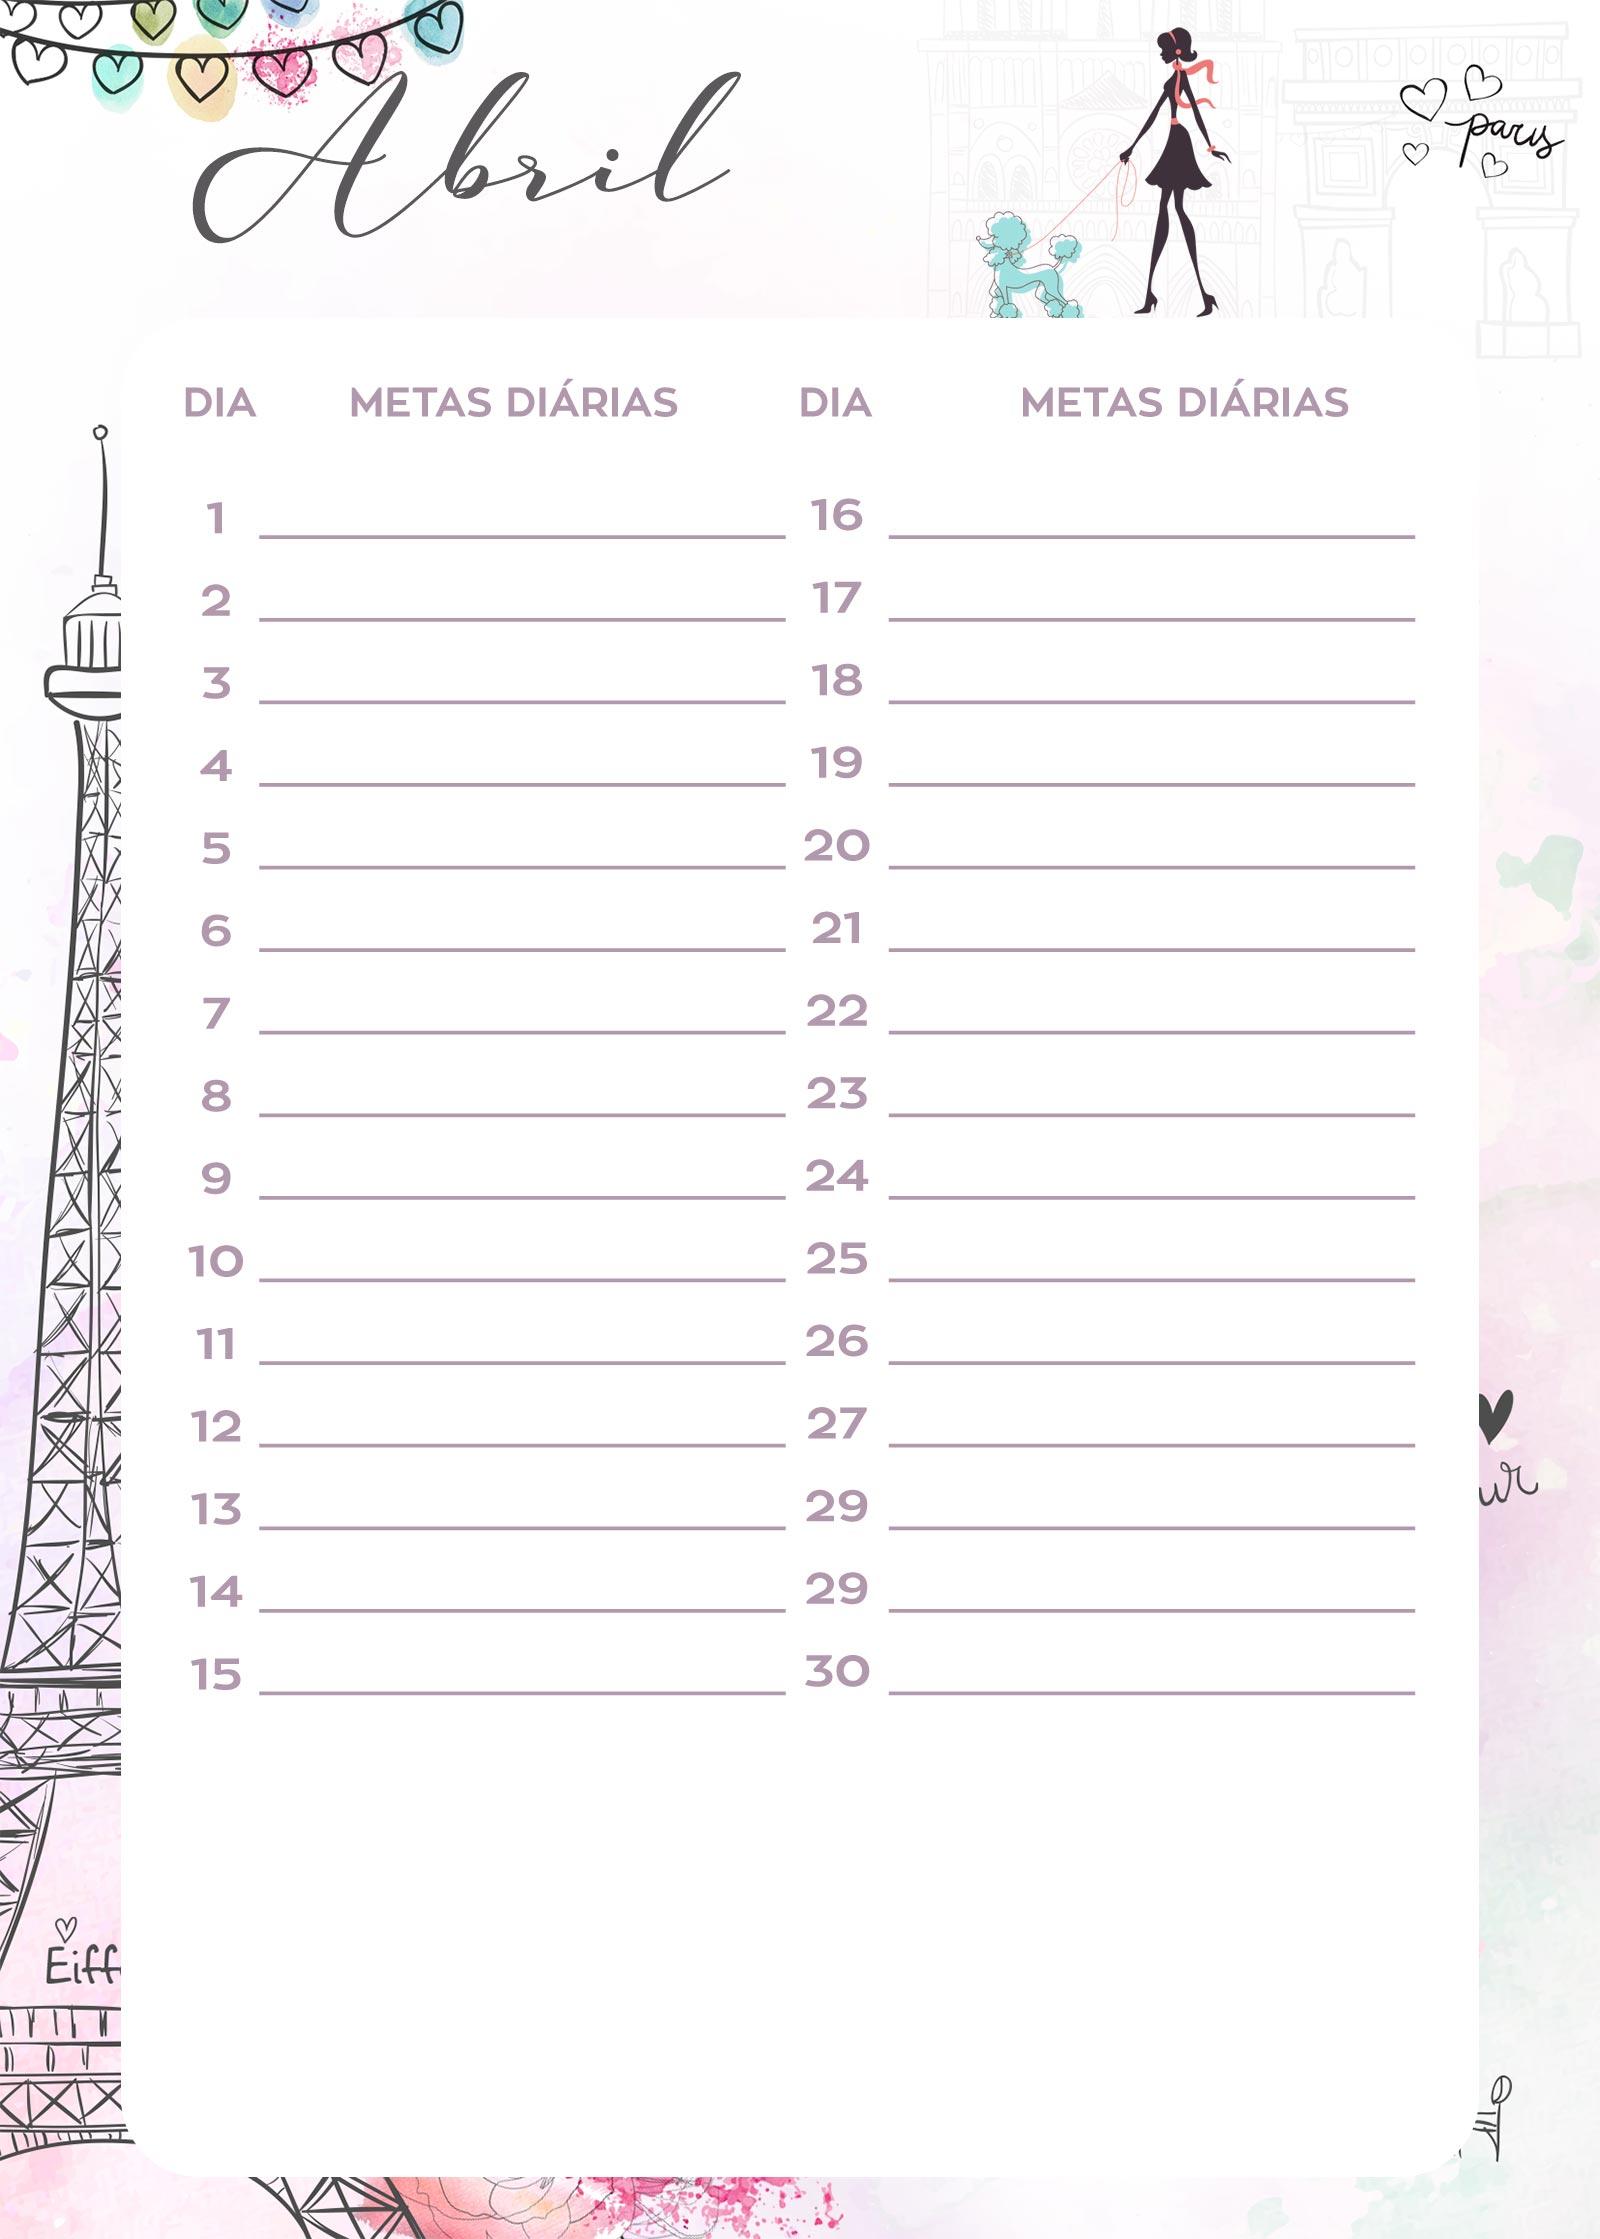 Planner Paris metas diarias abril